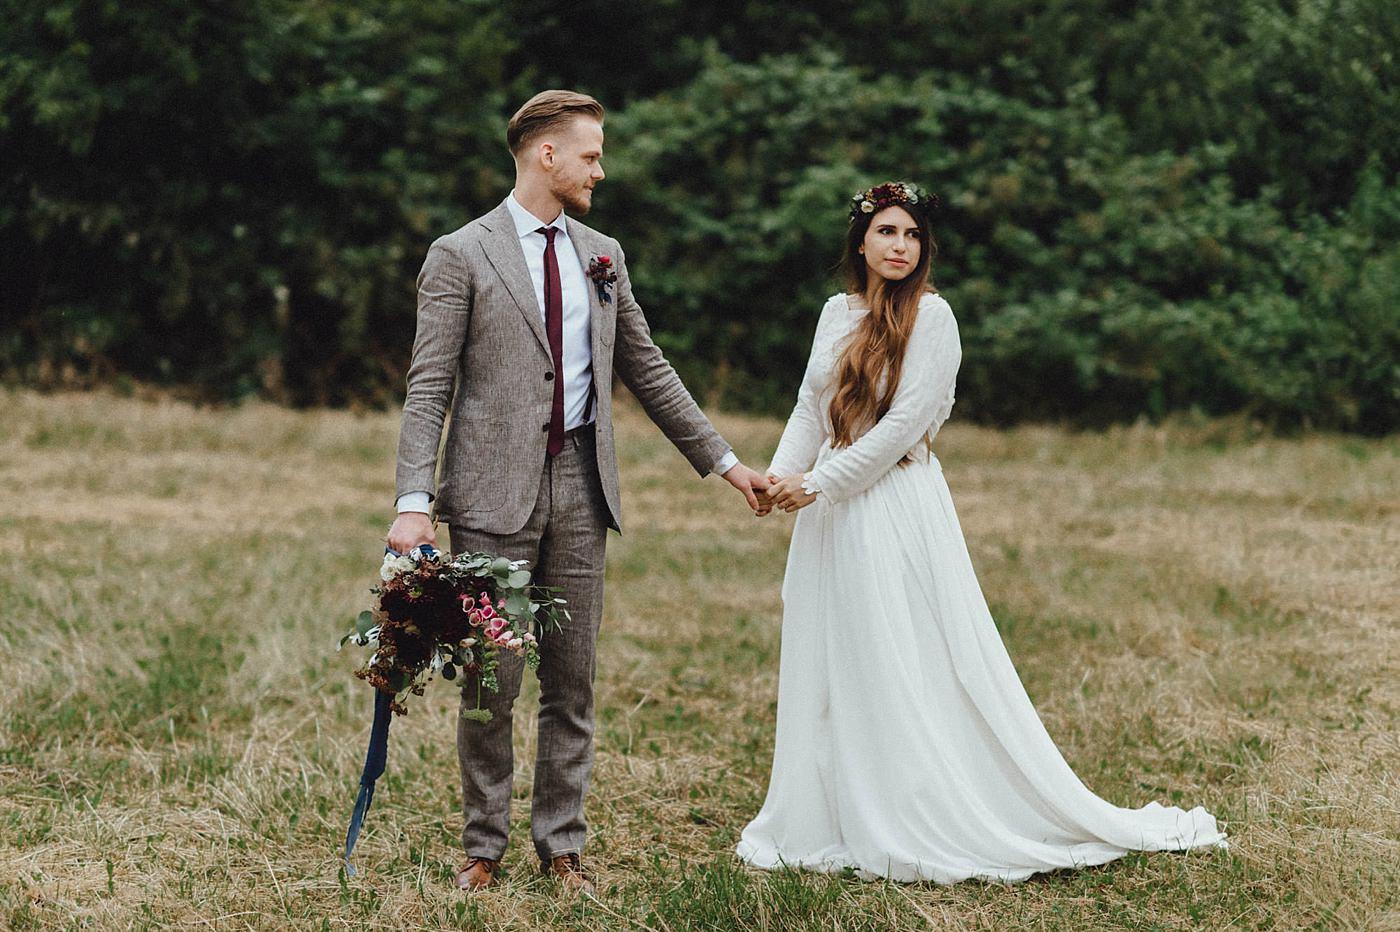 urban-elopement-wedding-214